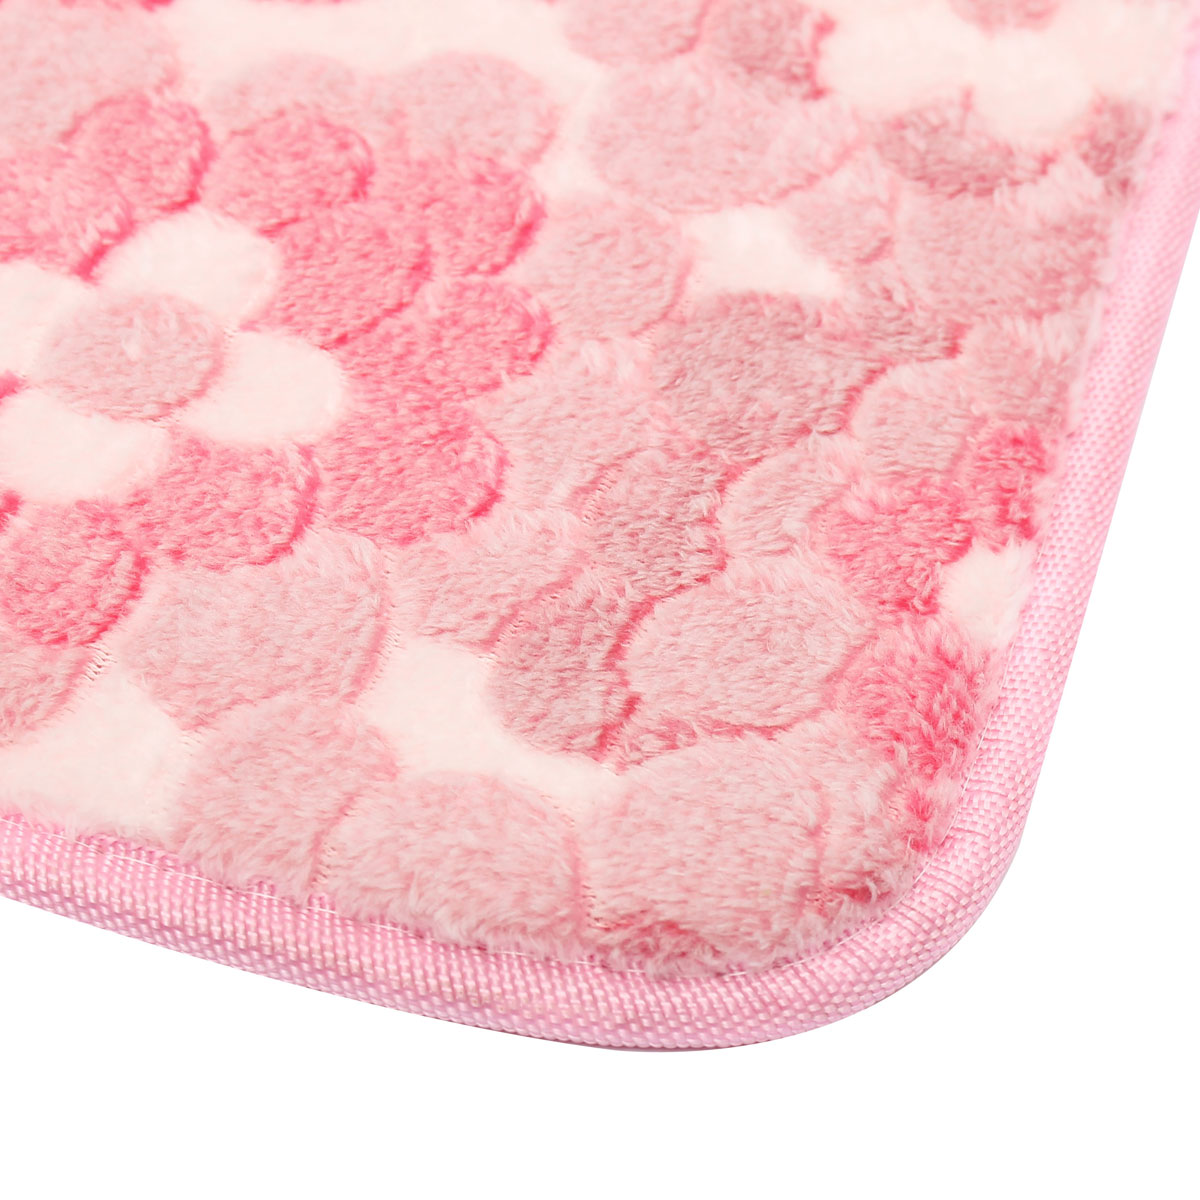 New Soft Non-slip Carpet Floor Mat Rug Shower Bathroom Bedroom Home Kitchen Pad Pink Flowers ...